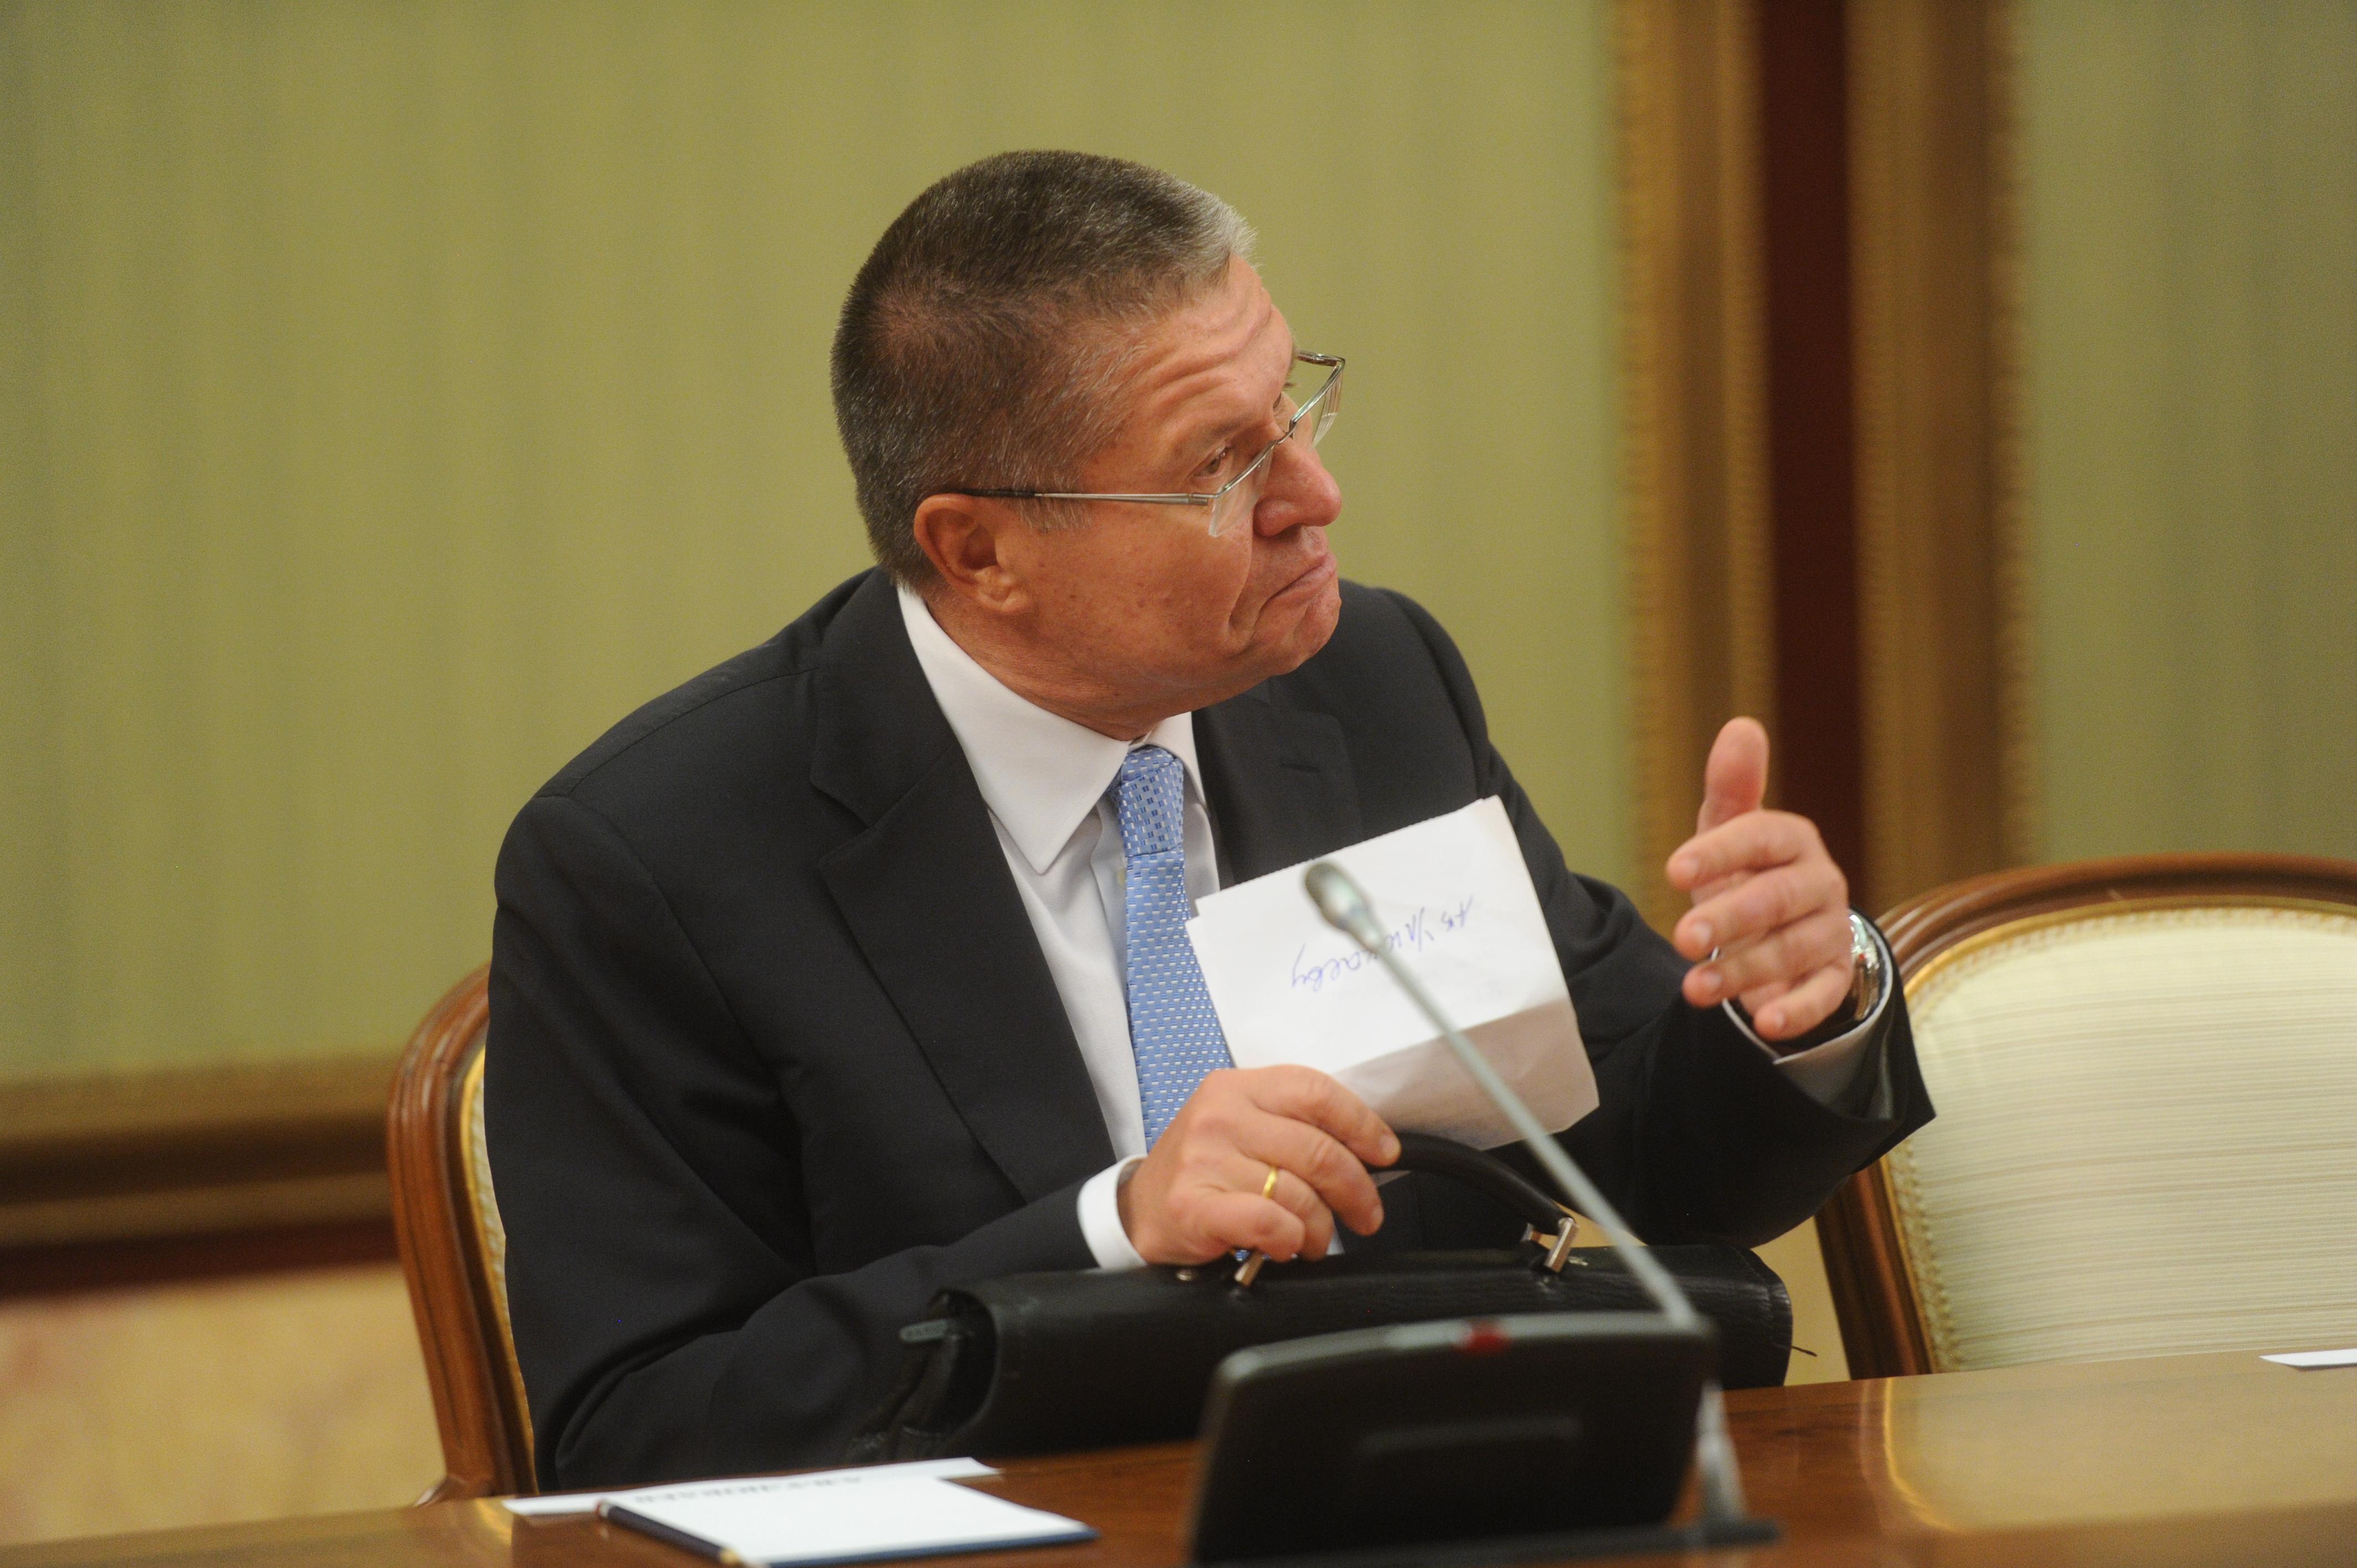 Улюкаева разрабатывали более одного года — ФСБ